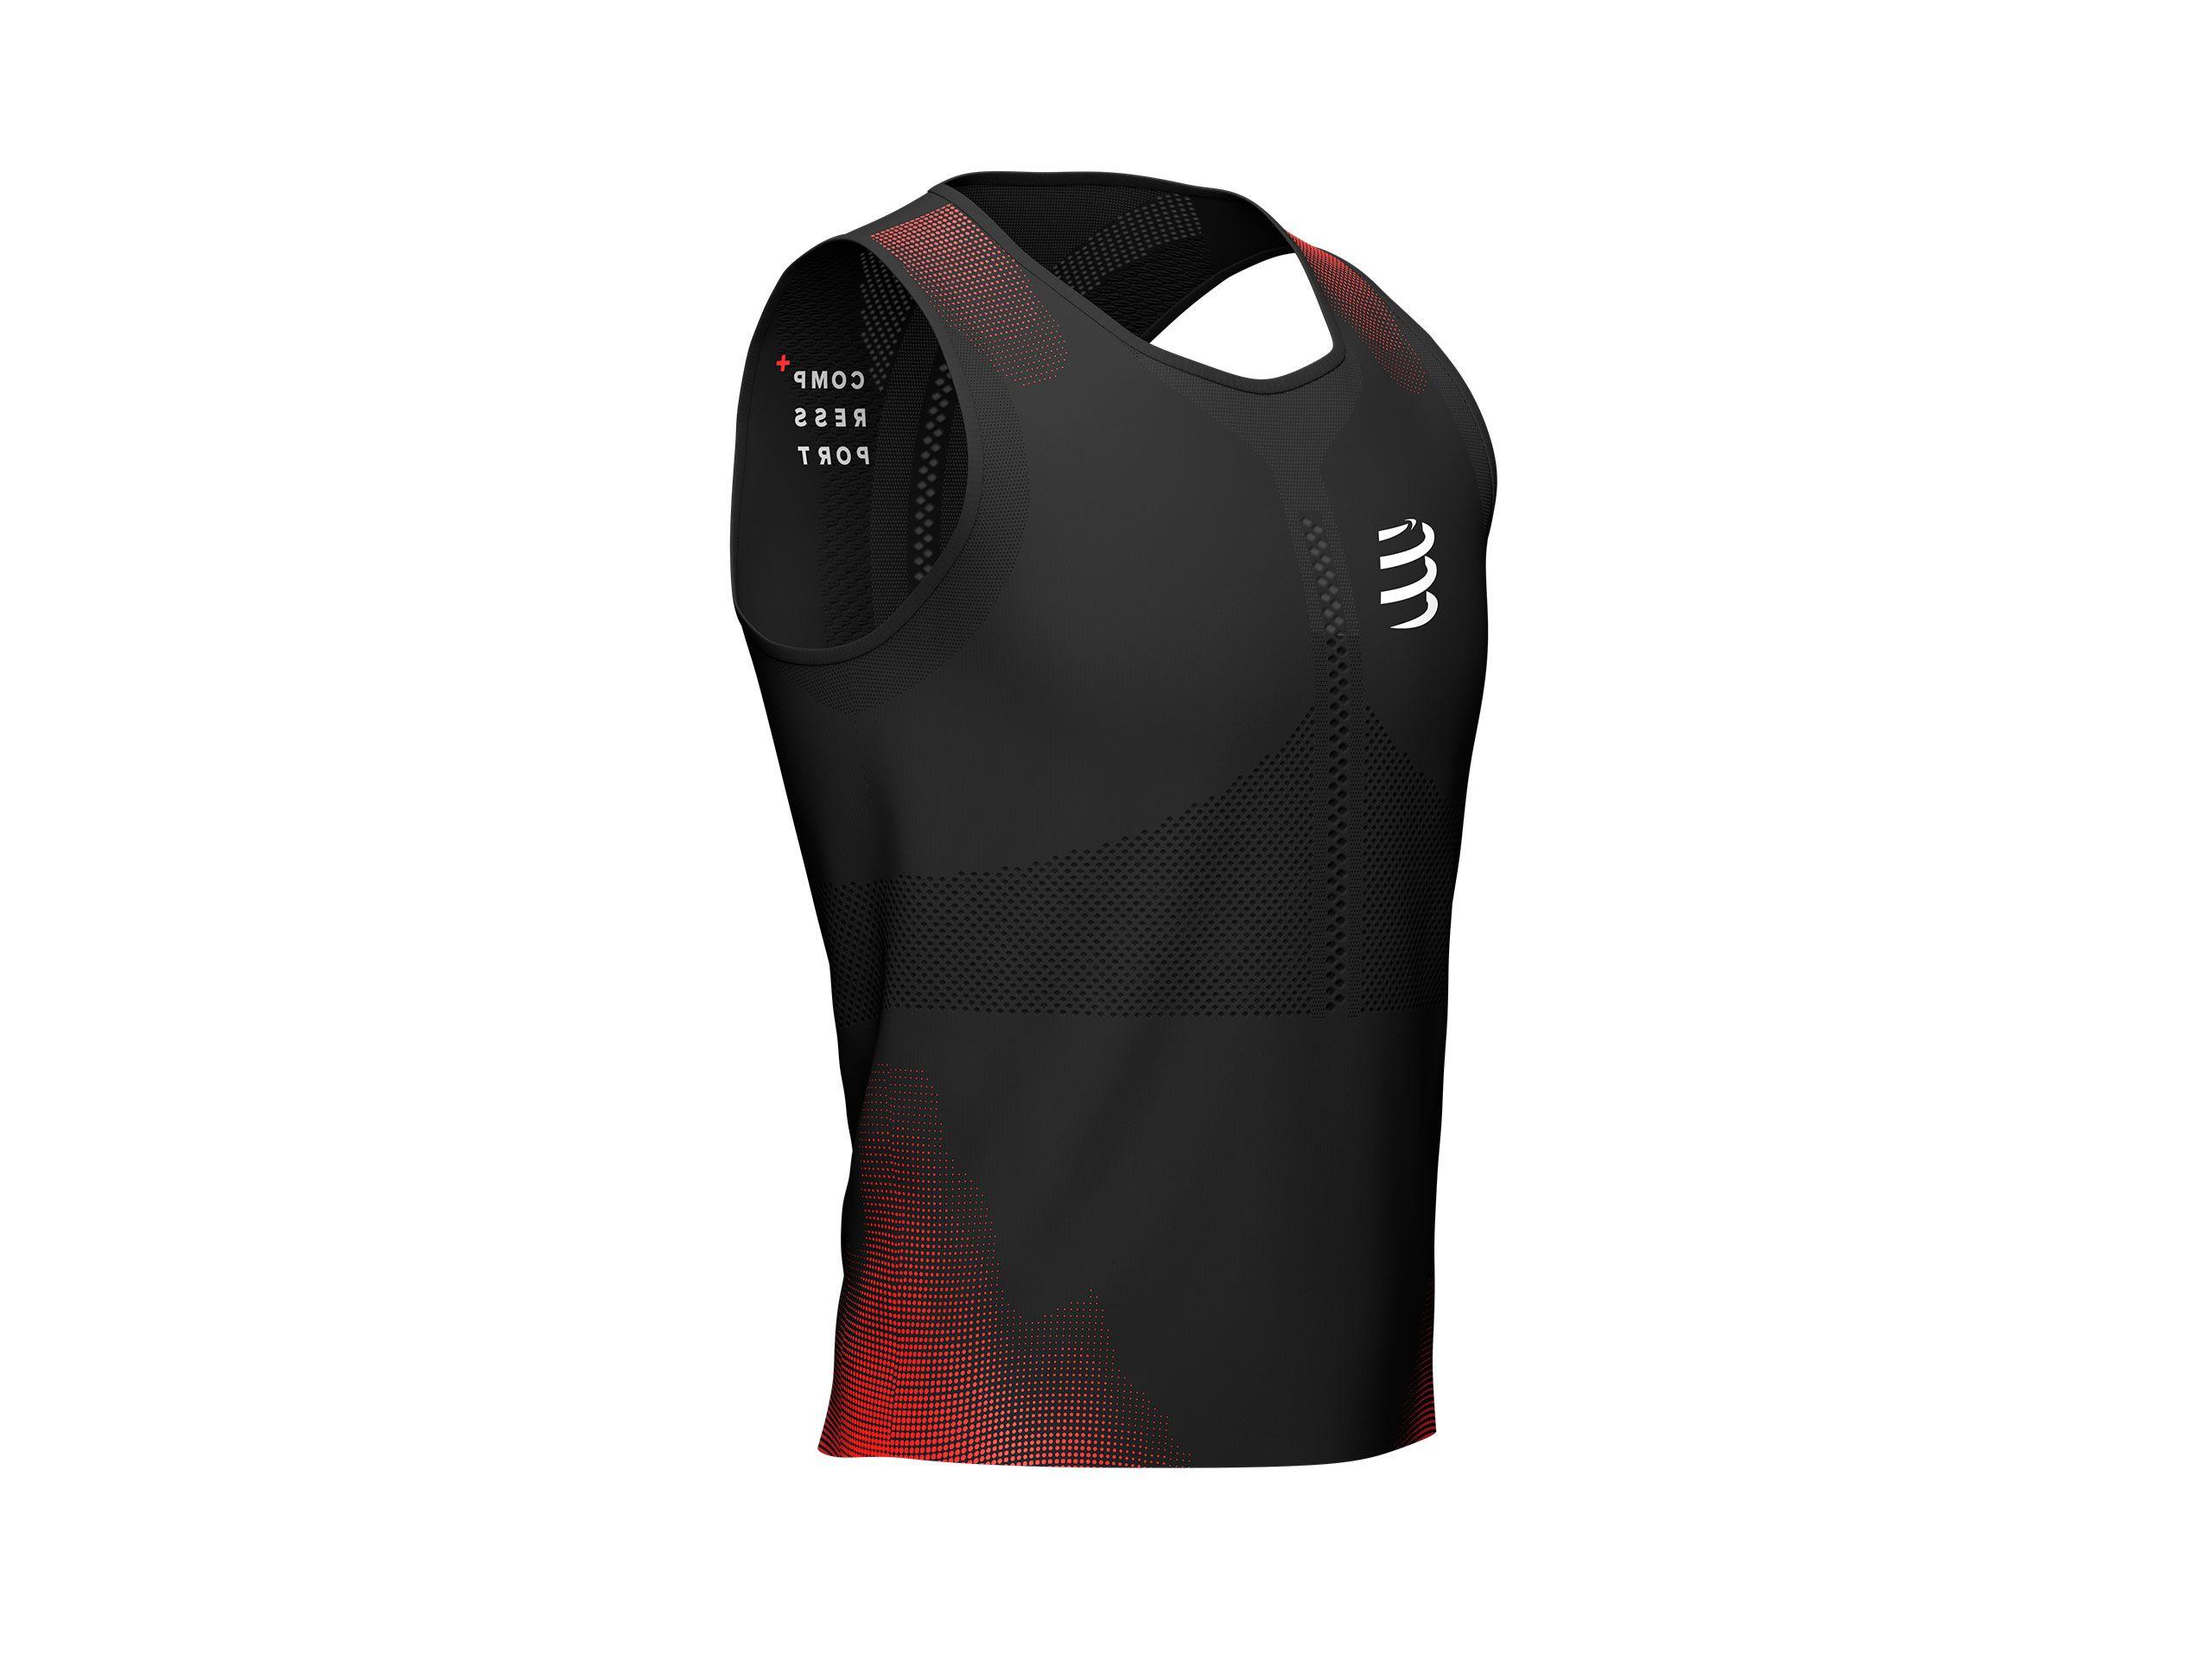 Compressport Racing Singlet · Producto Compressport · Camisetas · Kukimbia Shop - Tienda Online Deportiva